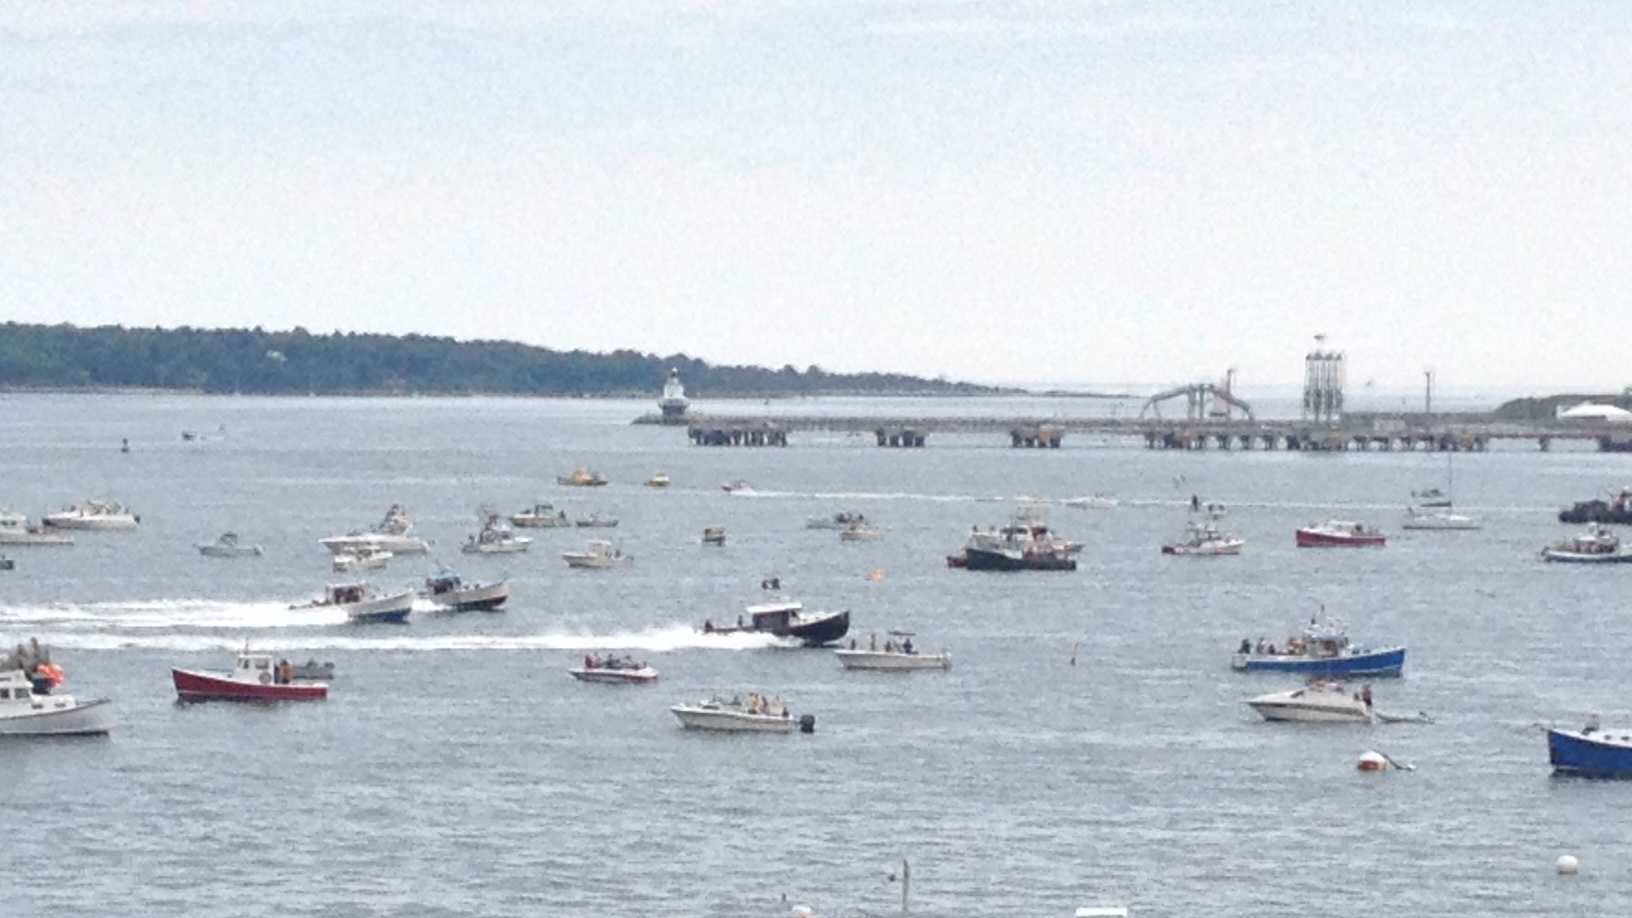 Lobster & Tug Boat Races